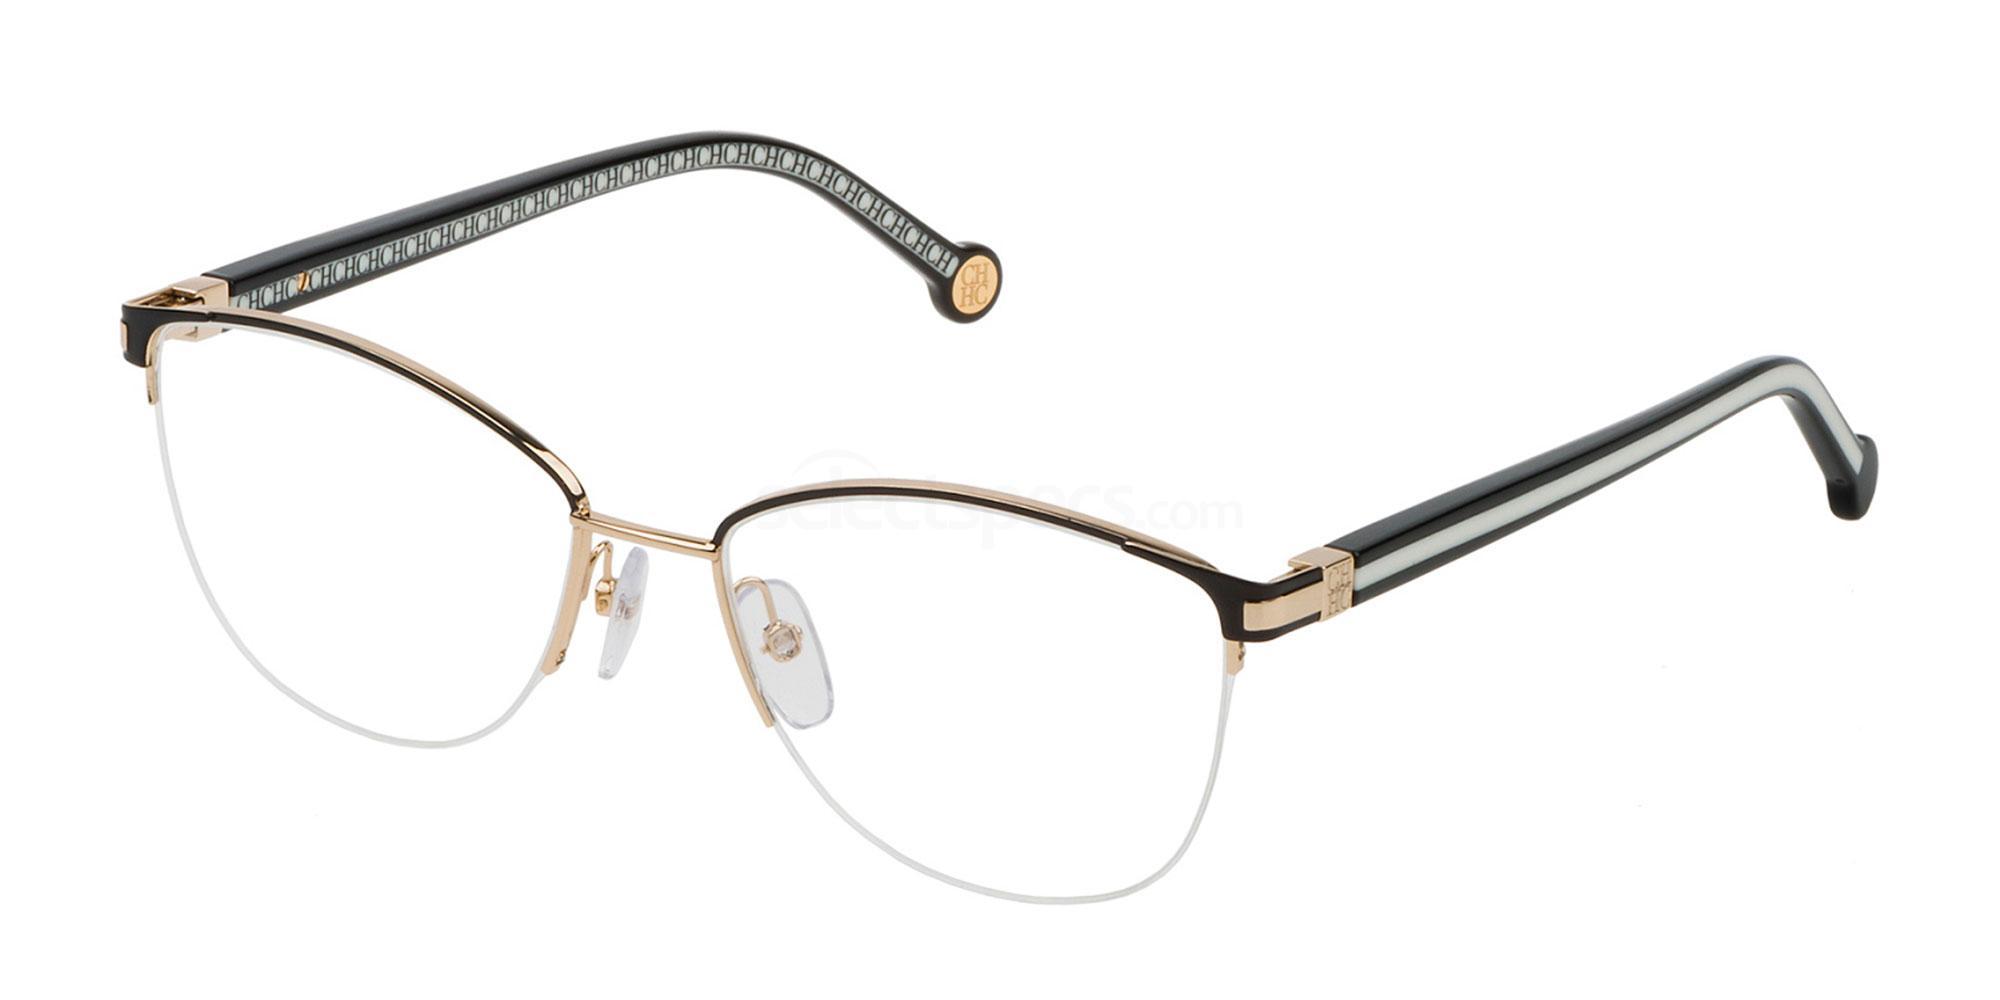 0304 VHE112 Glasses, CH Carolina Herrera